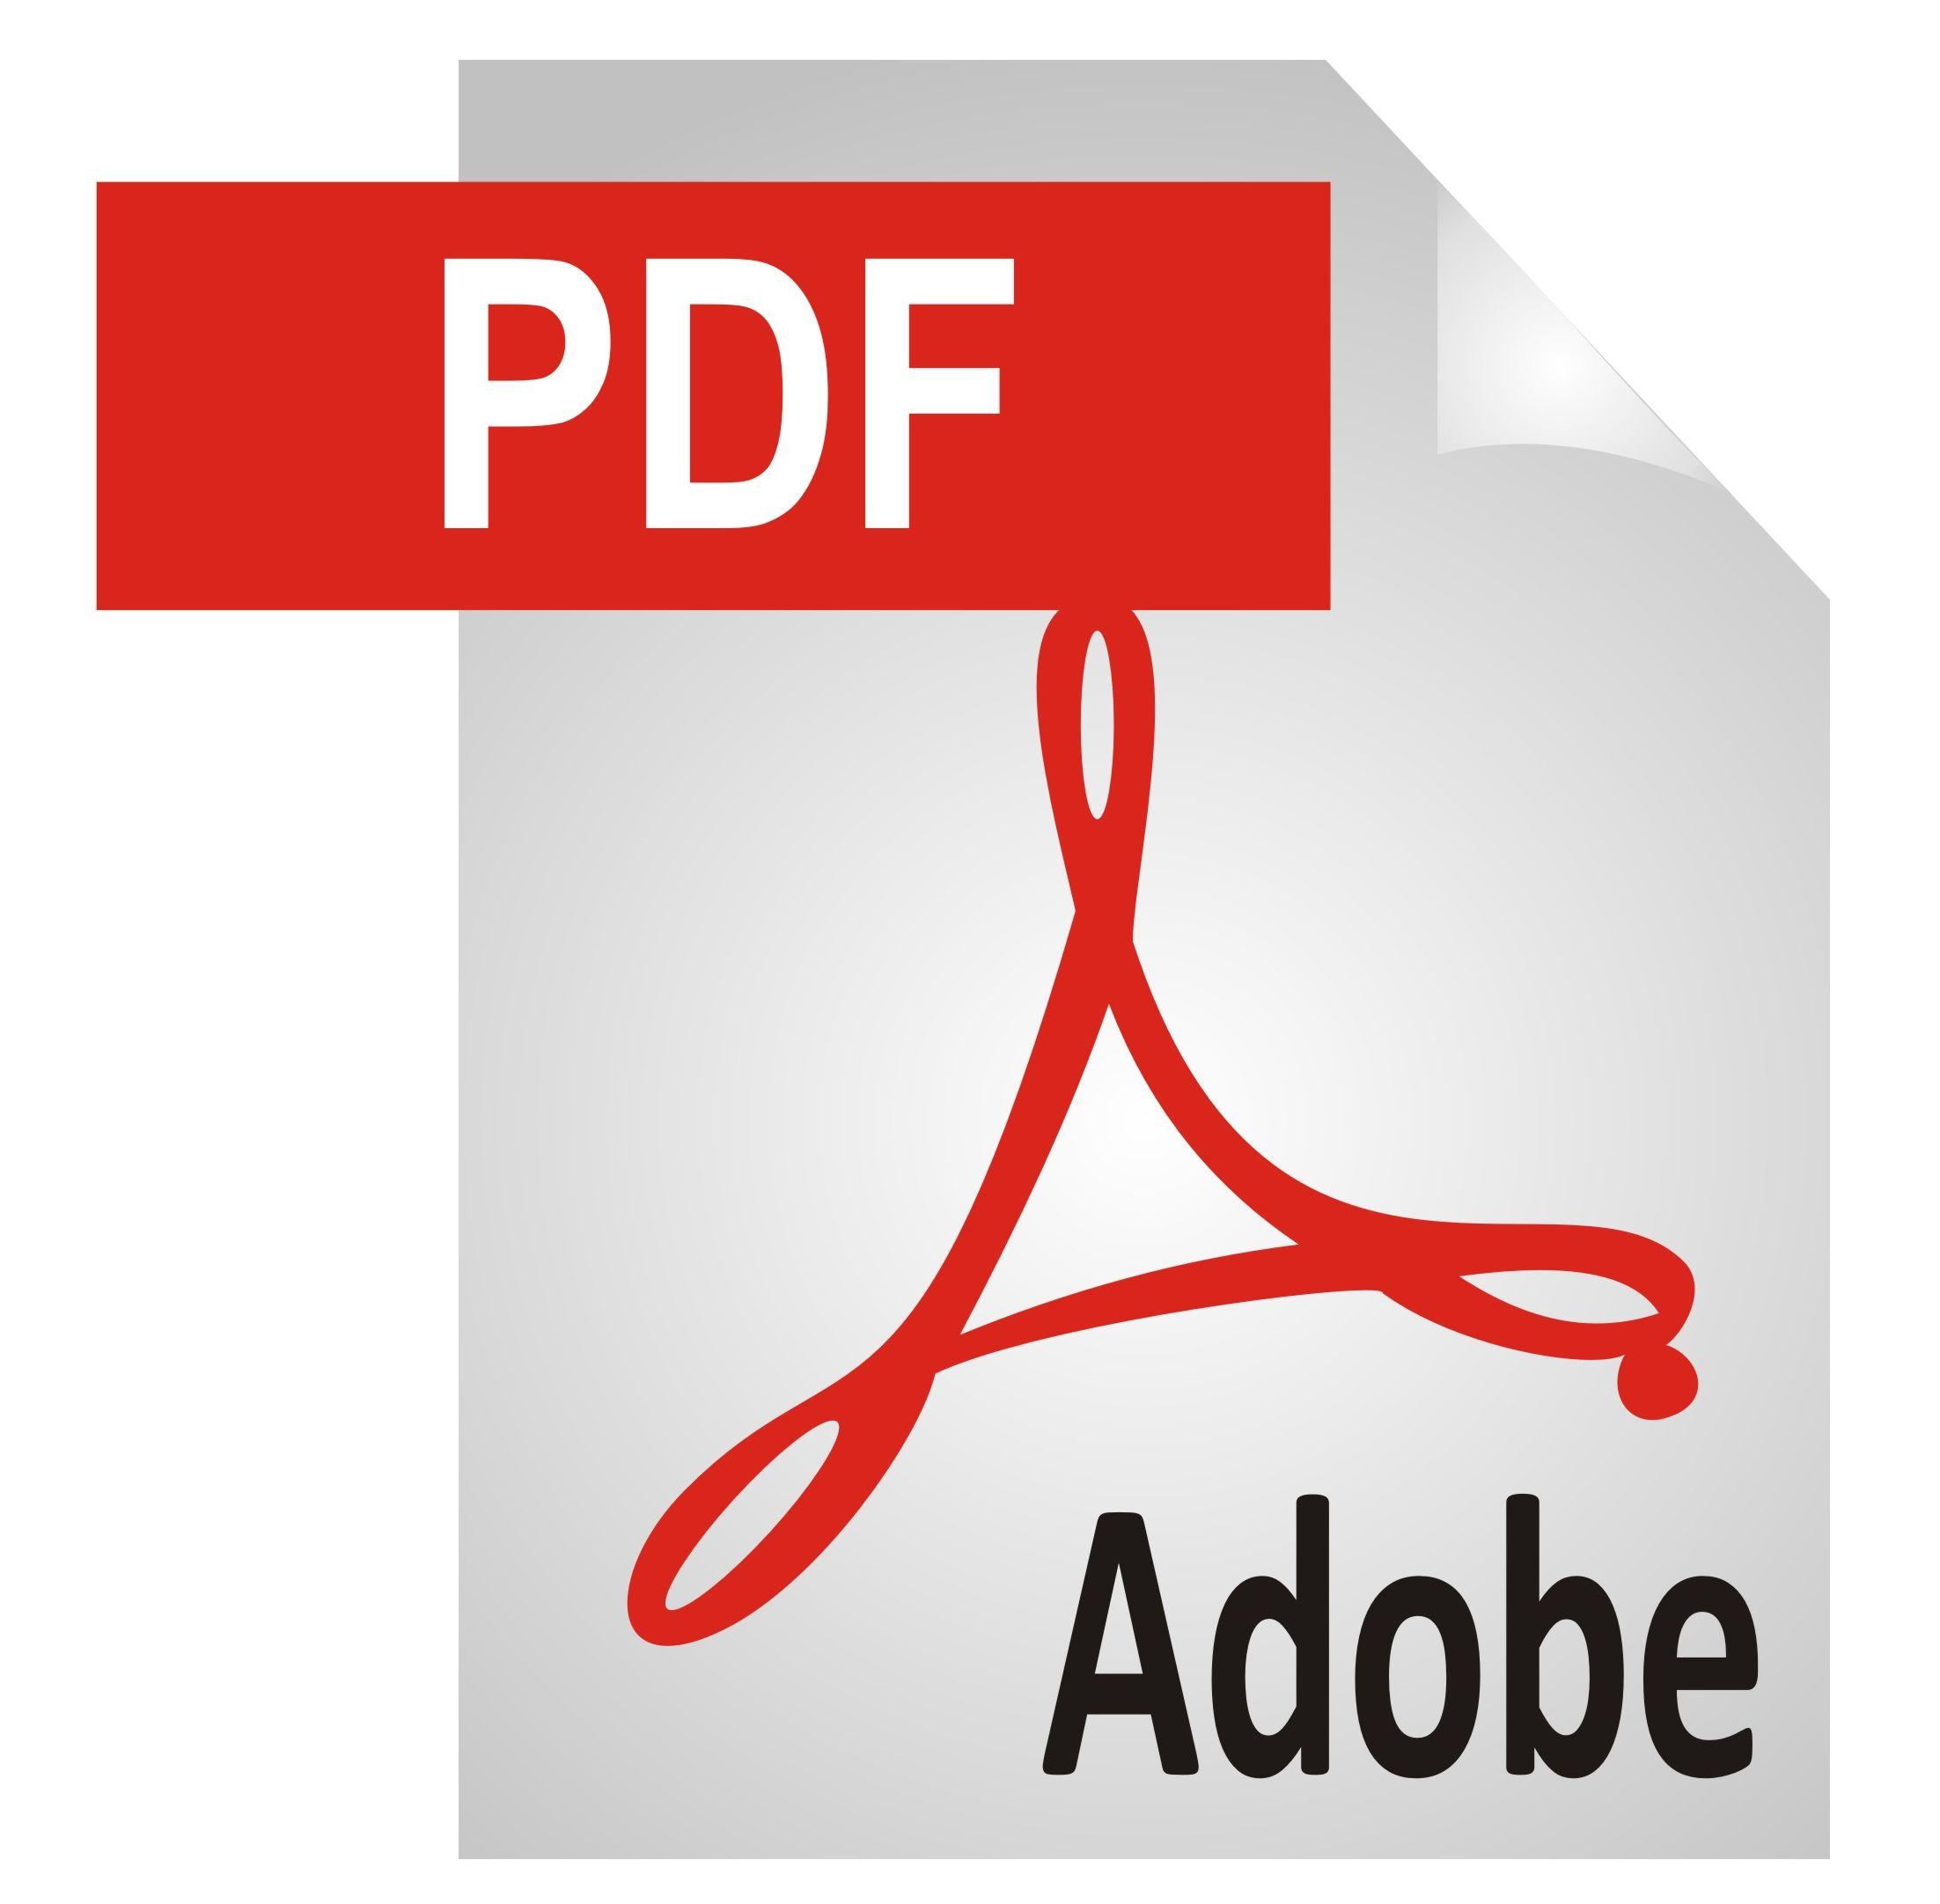 A1 - Adobe_PDF_Logo.jpg